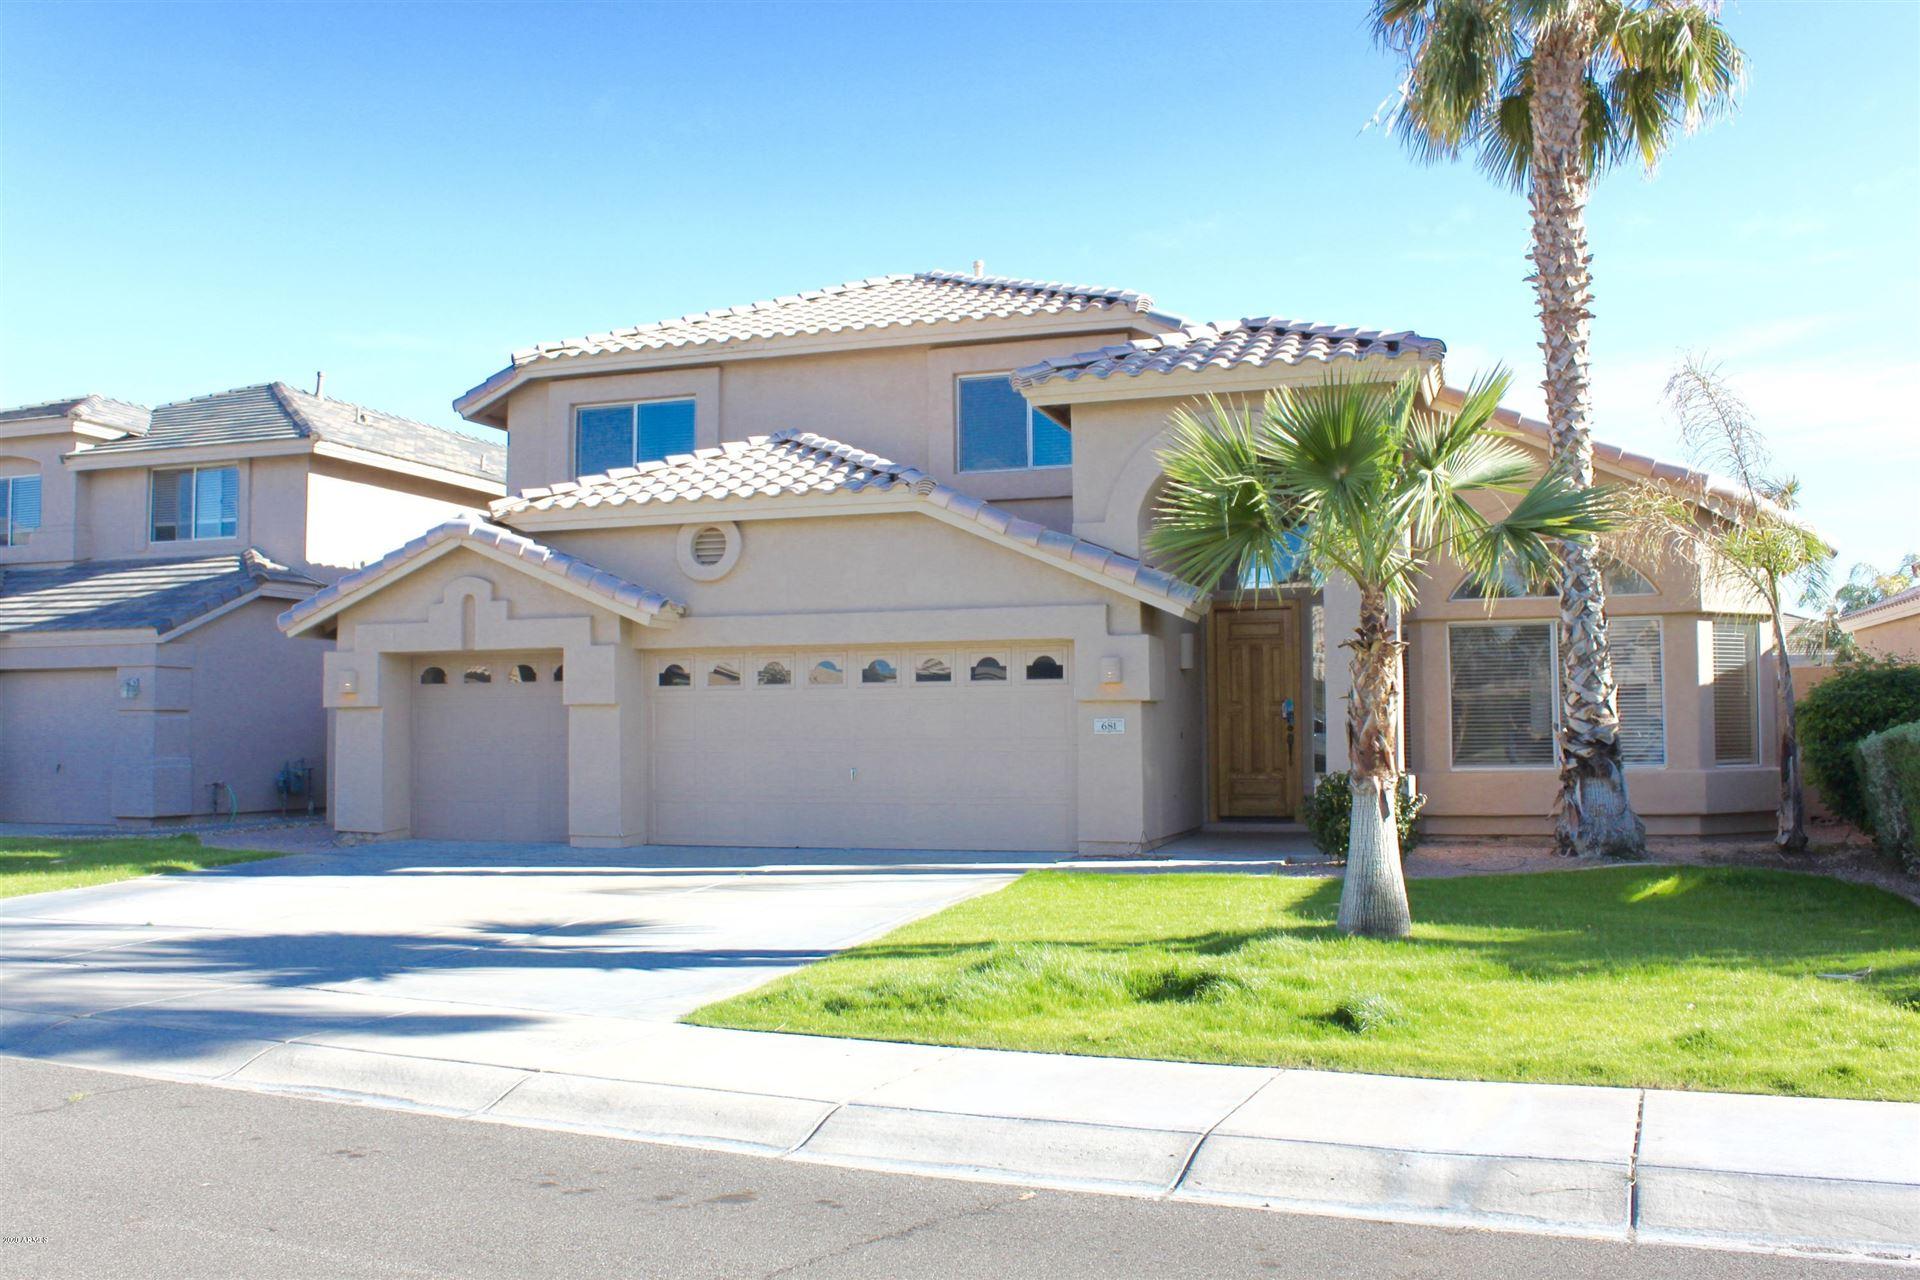 681 W HACKBERRY Drive, Chandler, AZ 85248 - #: 6055261